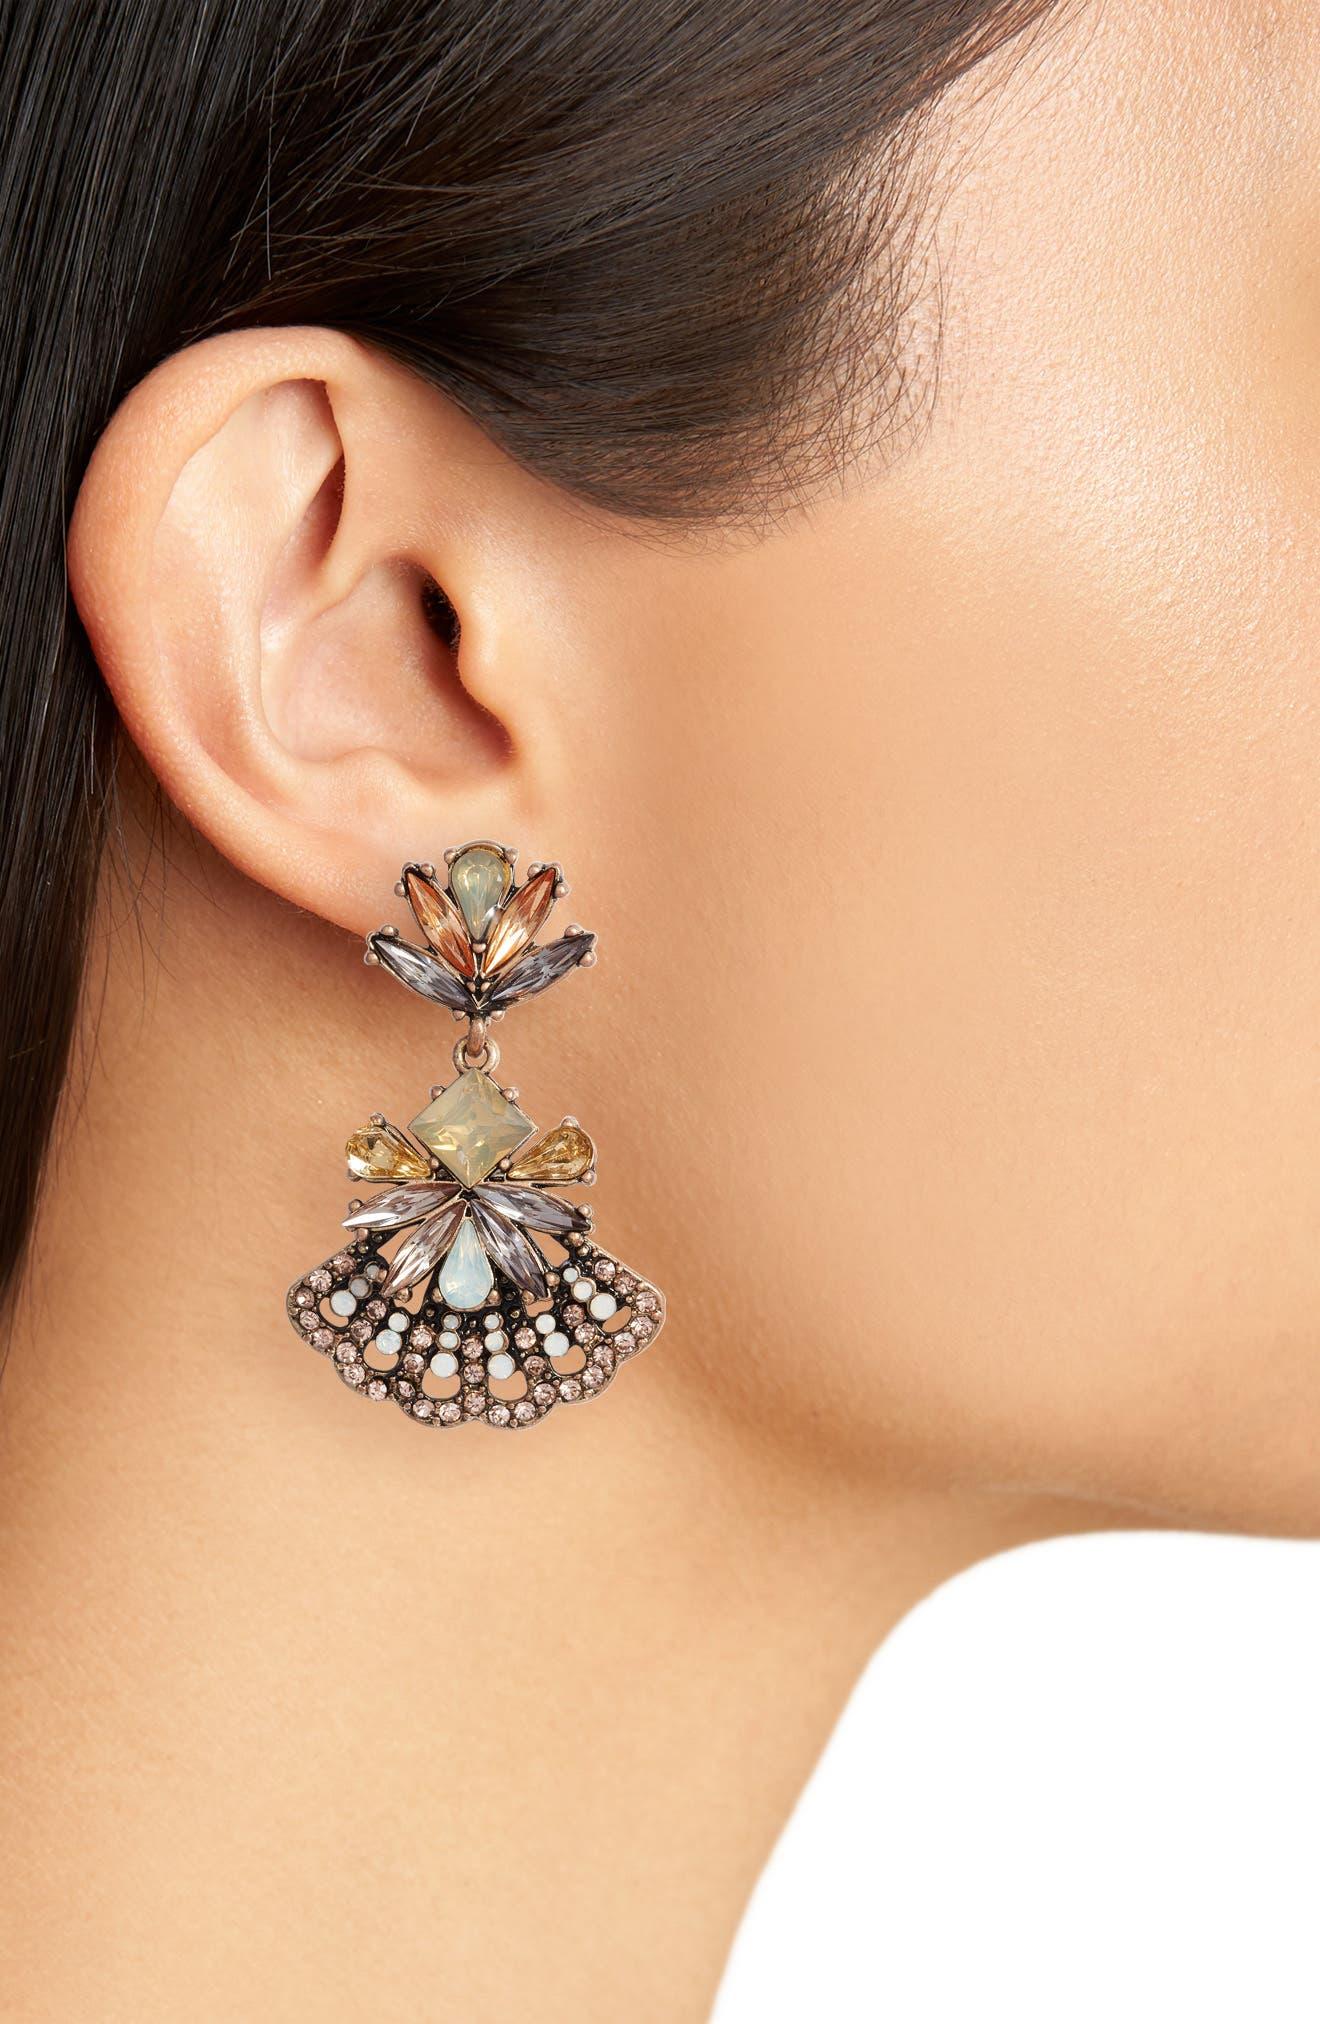 Crystal Fan Earrings,                             Alternate thumbnail 2, color,                             710